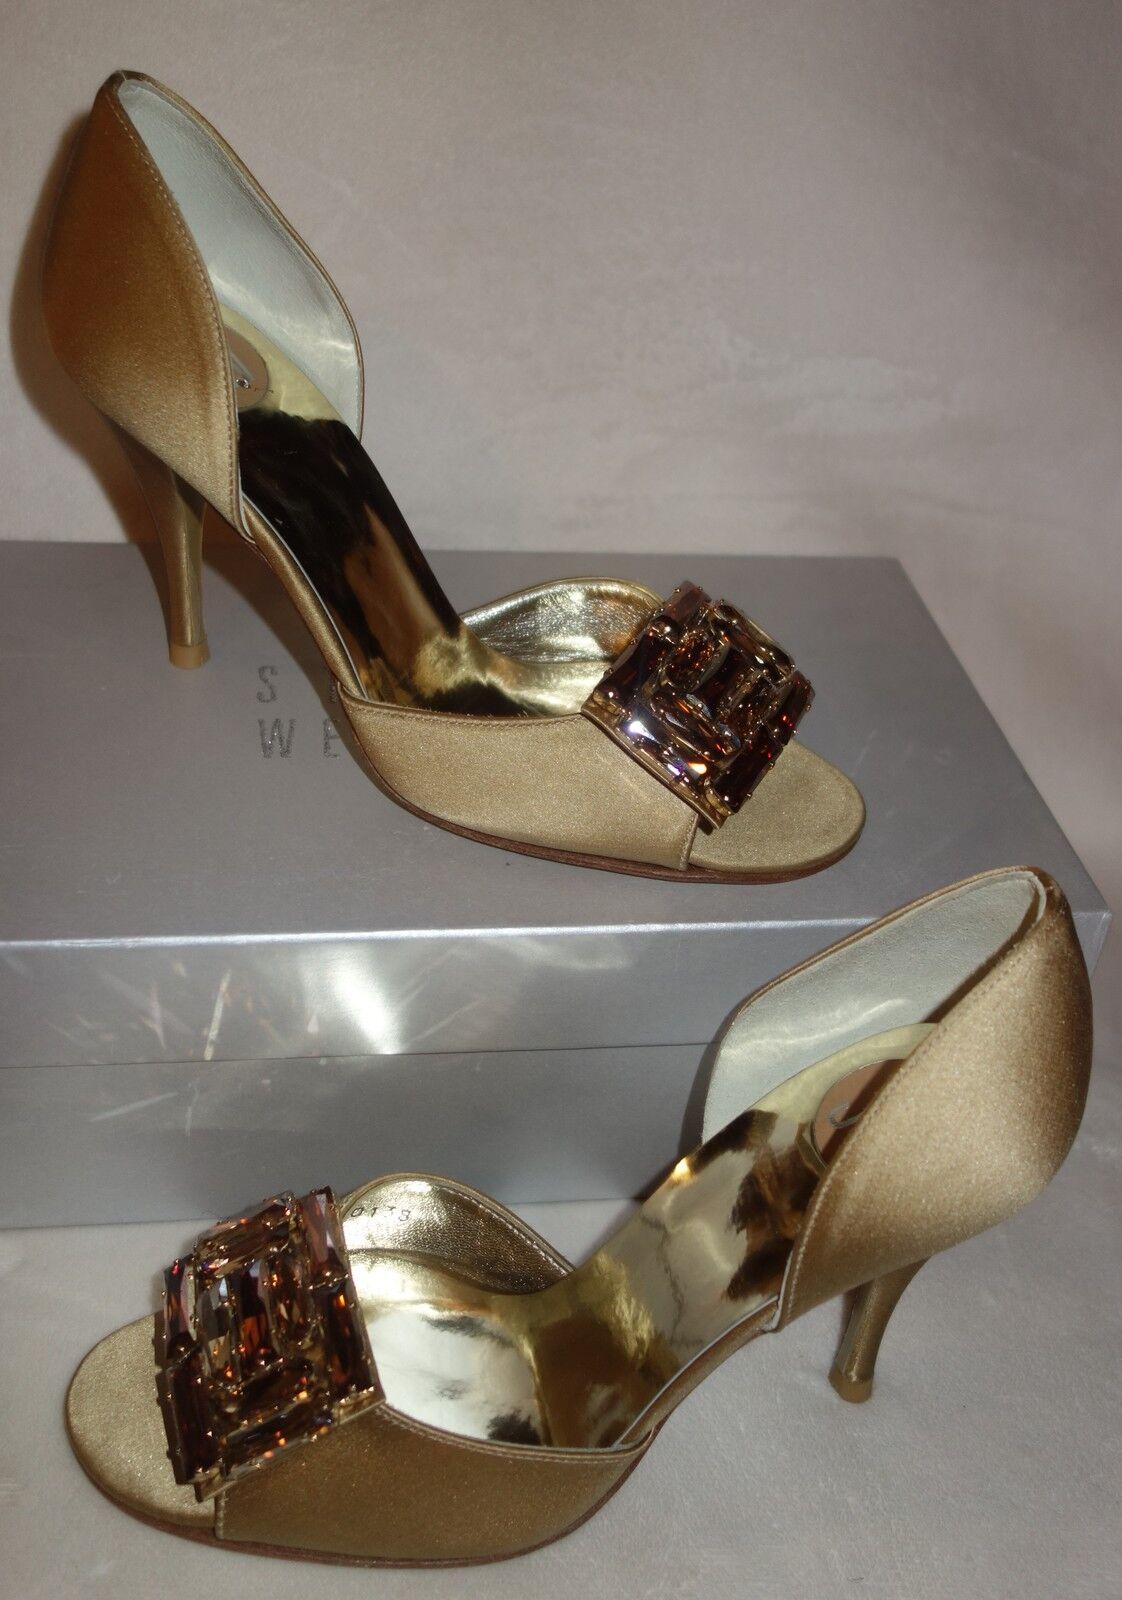 risparmia fino al 70% Stuart Weitzman 'DCGemstones' scarpe  Sandals sz 36 US SZ SZ SZ 5.5 new  marche online vendita a basso costo